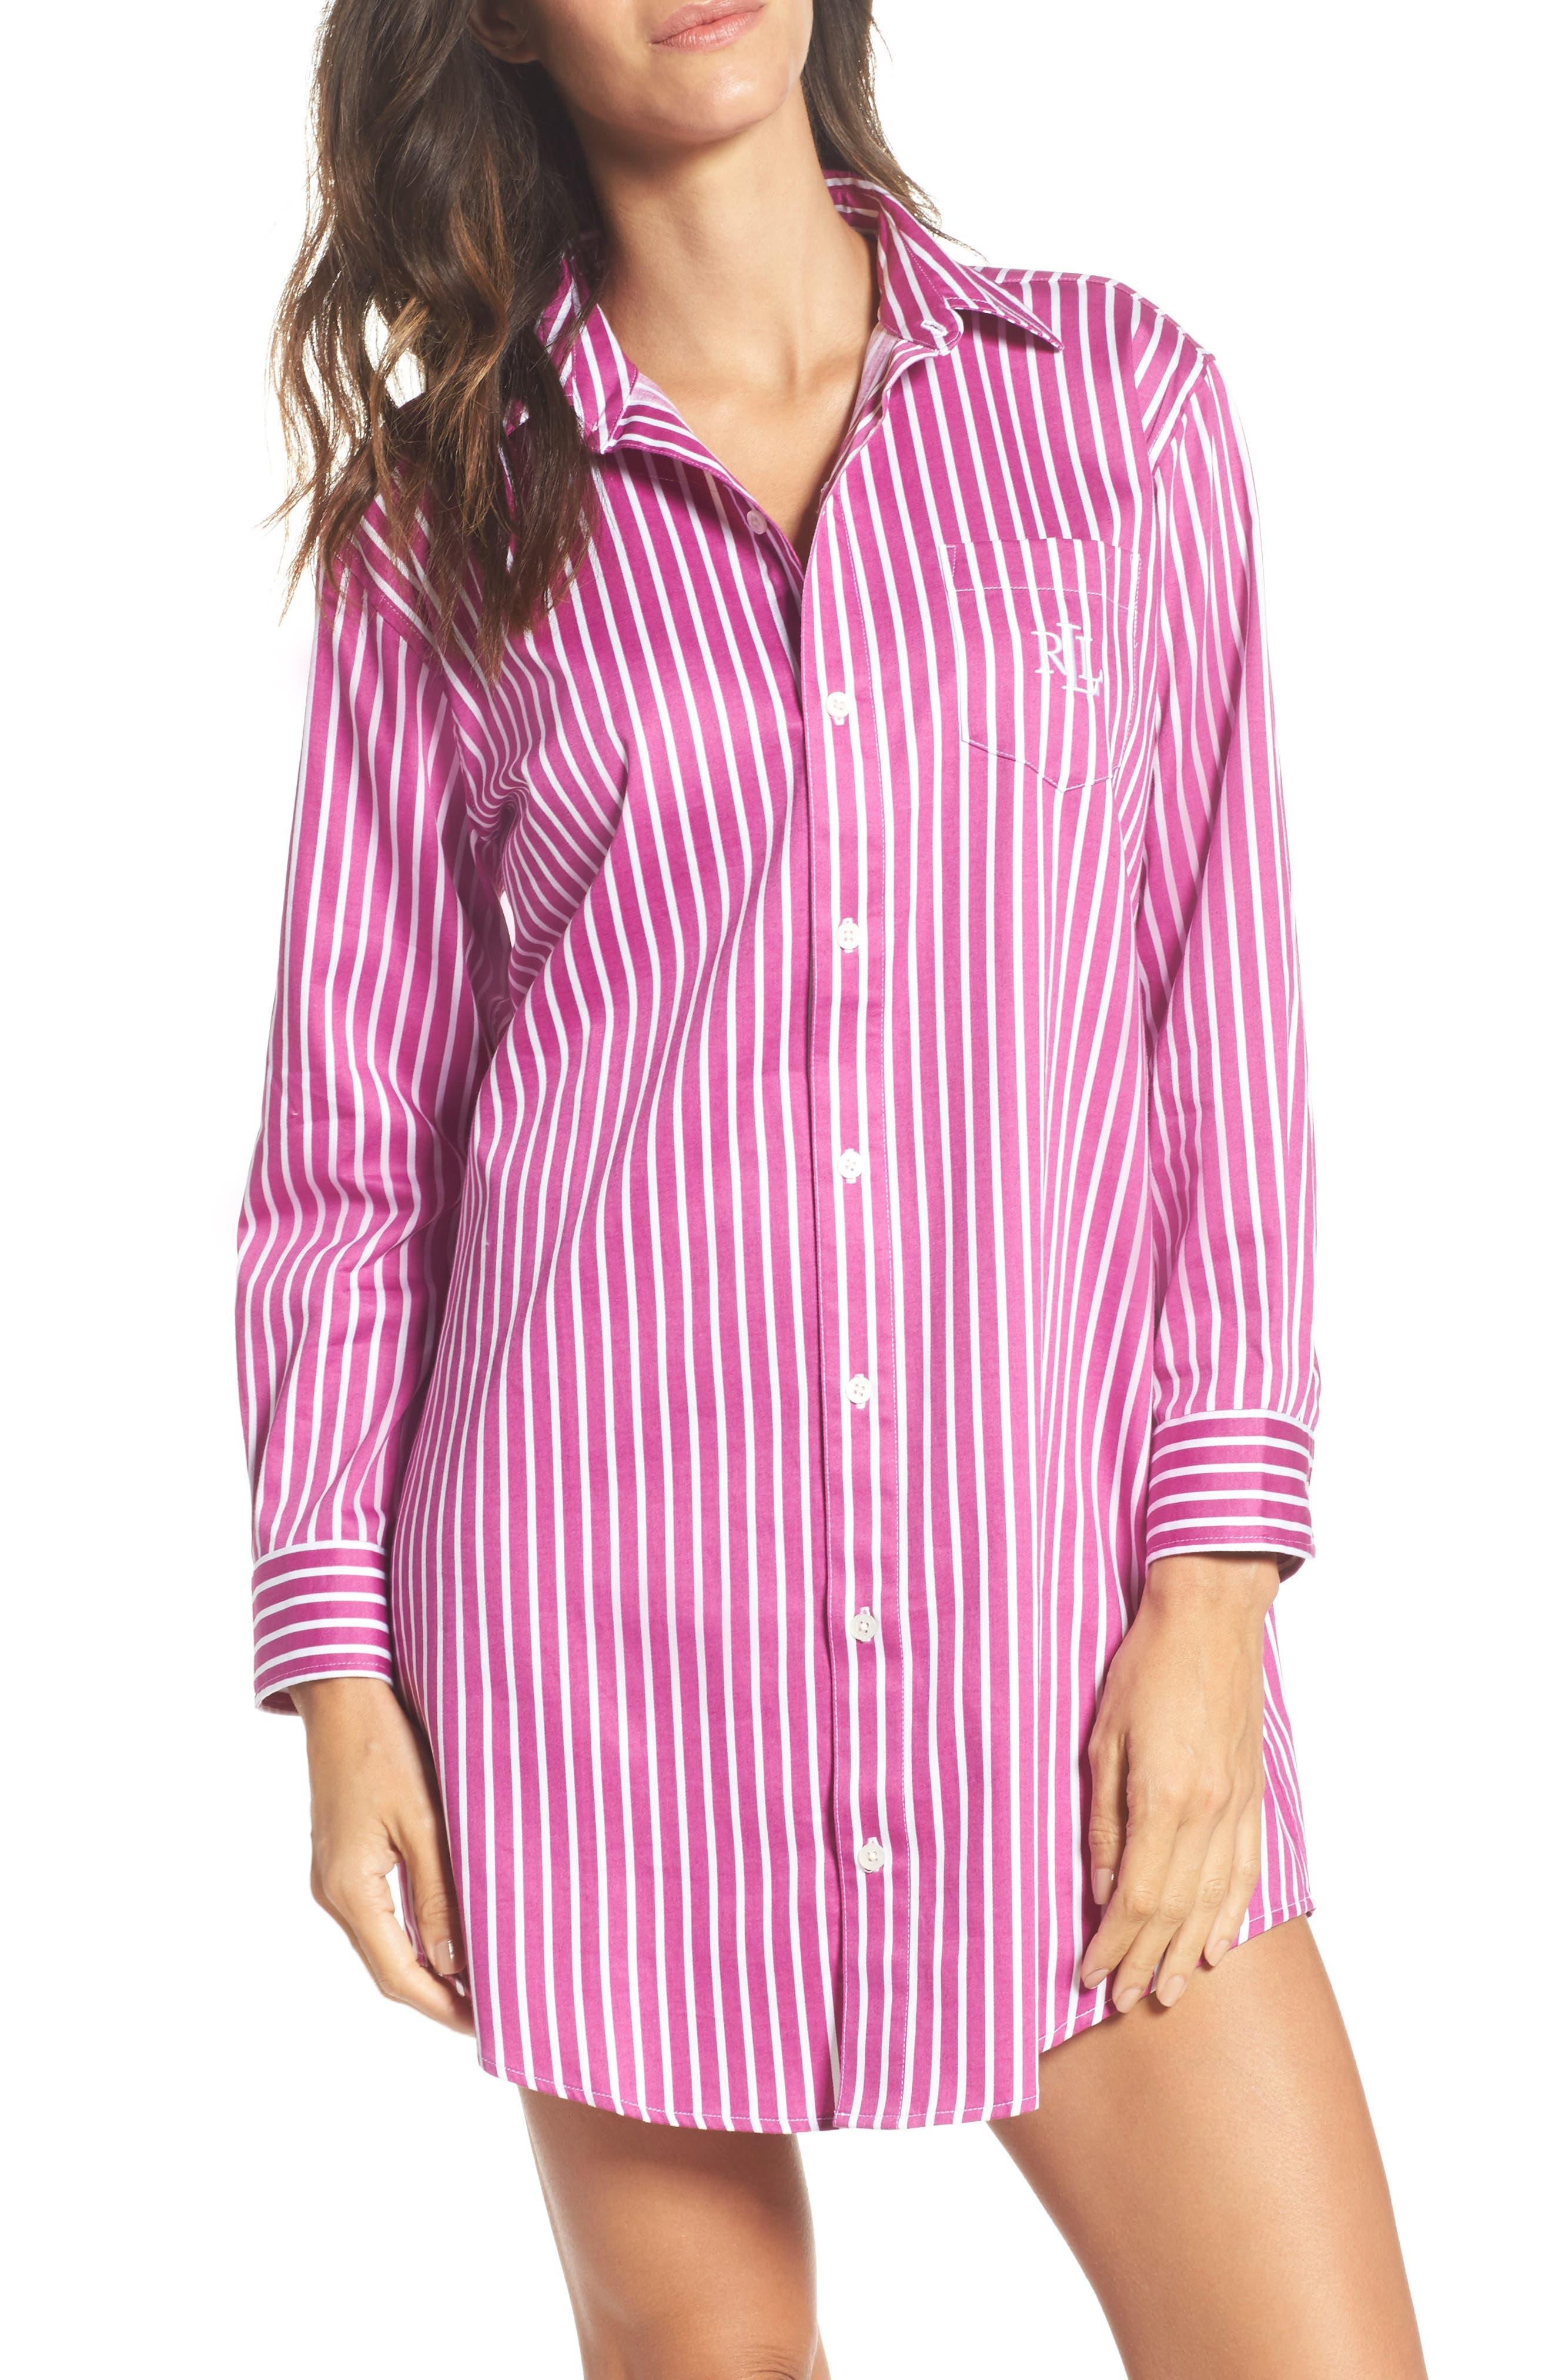 Sleep Shirt,                         Main,                         color, Pink/ White Stripe